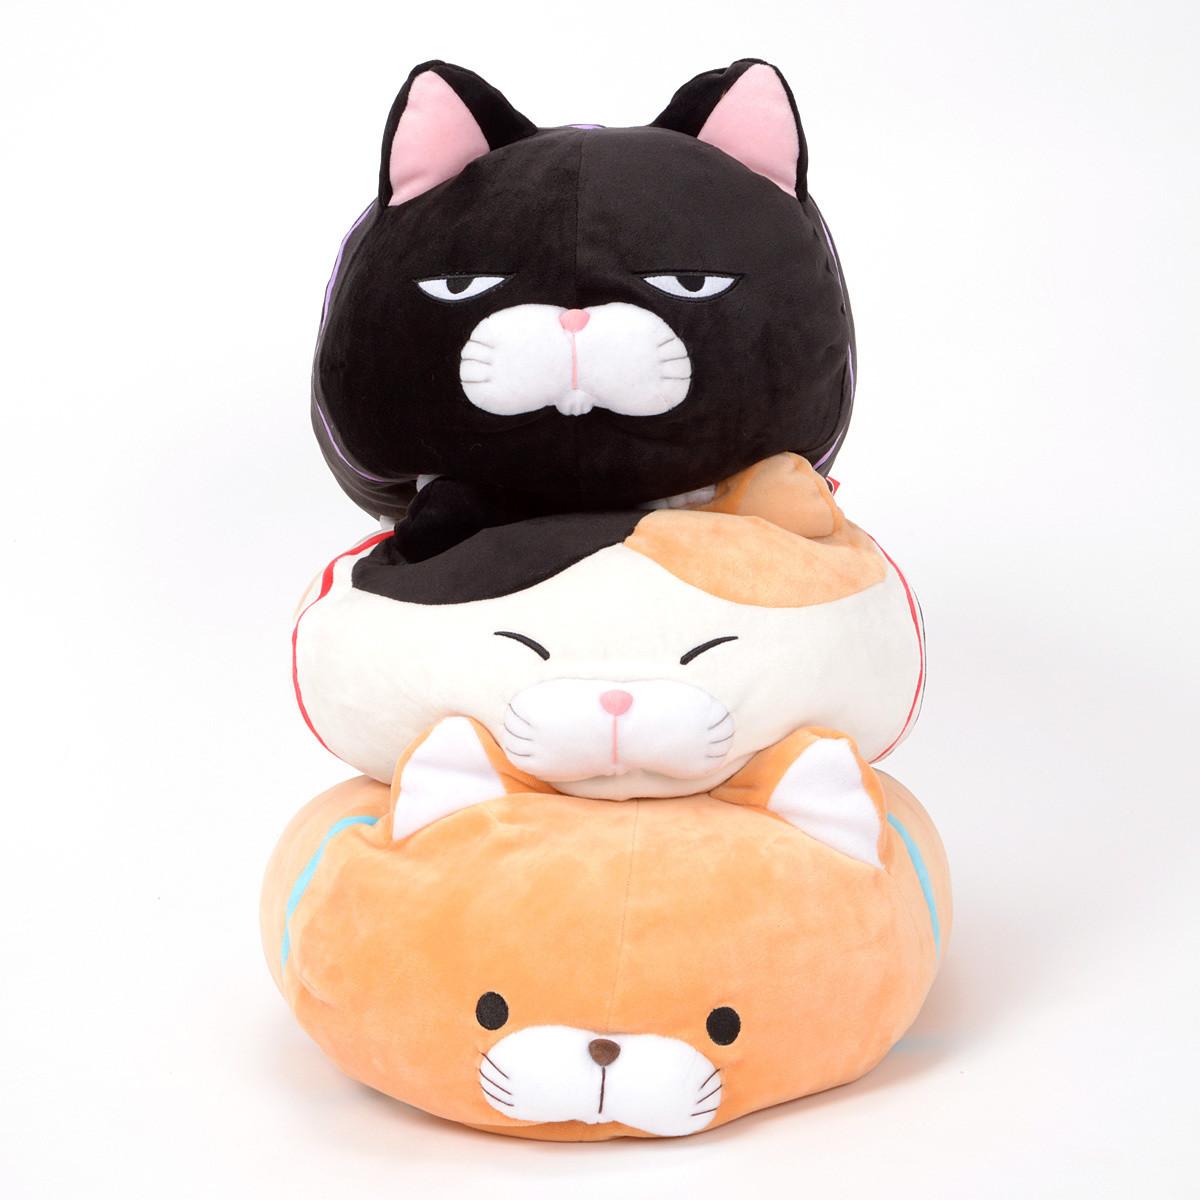 Tsumeru Mochikko Hige Manjyu Cat Plush Collection Big